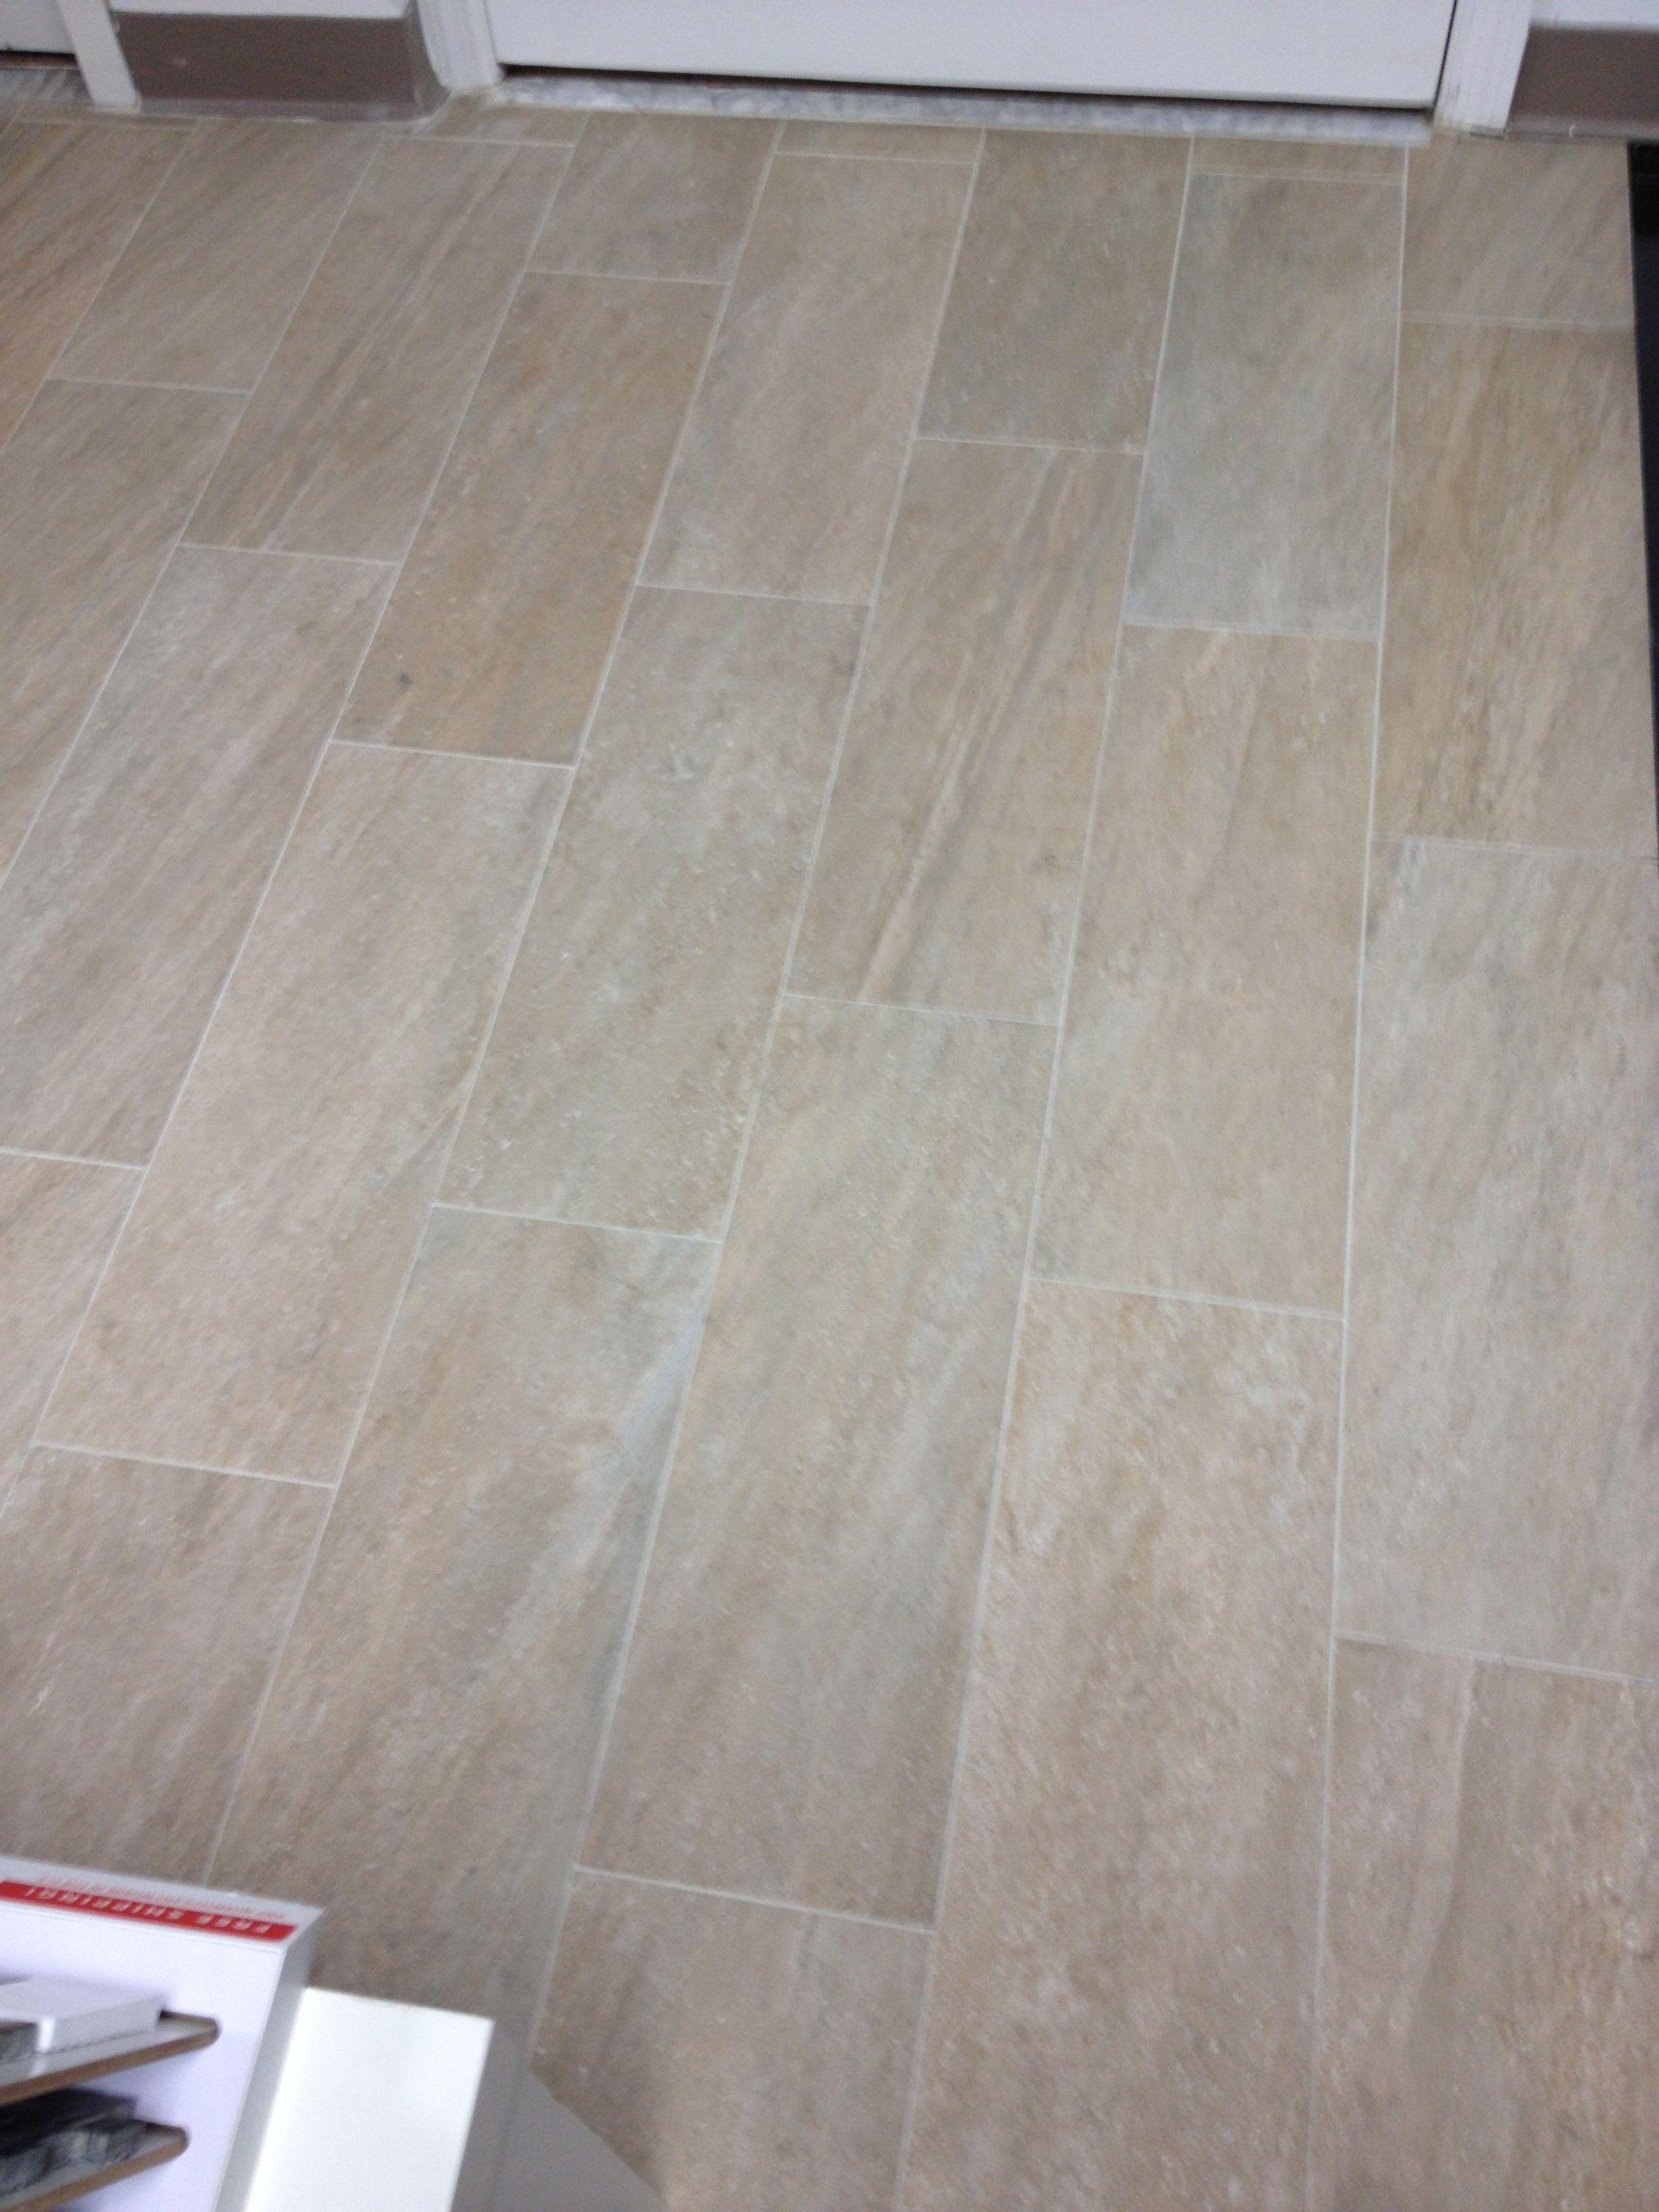 Purchased Lefka Floor Tile With Minimal Grout Lines Tile Floor Flooring Porcelain Floor Tiles